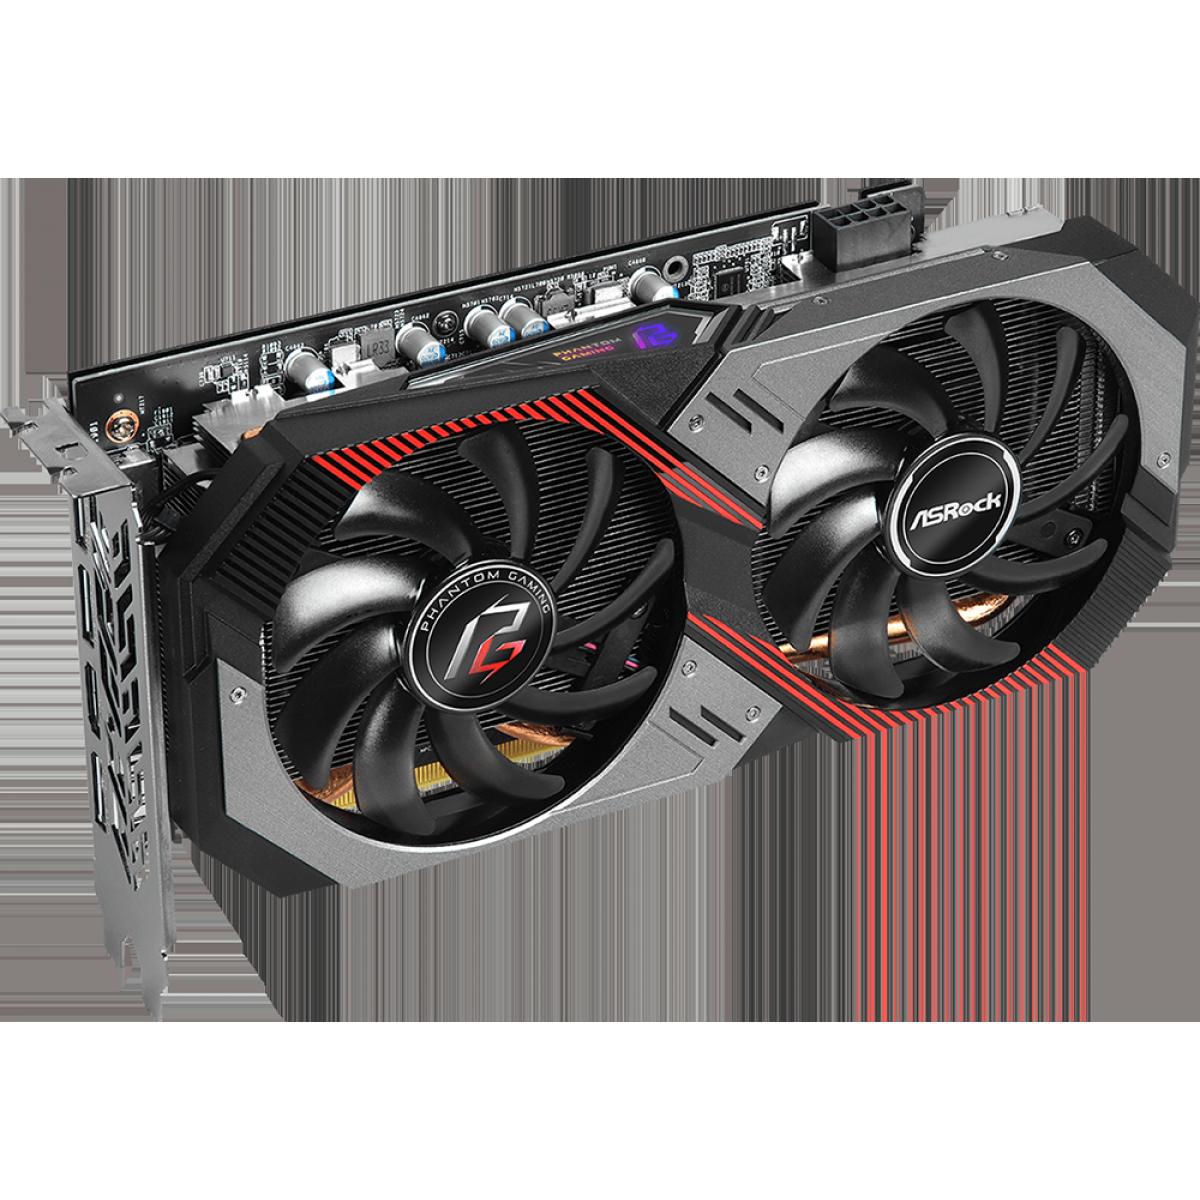 Placa de Vídeo ASRock, Radeon, RX 5600 XT Phantom Gaming D2 OC, 6GB, GDDR6, 192Bit, 90-GA1XZZ-00UANF